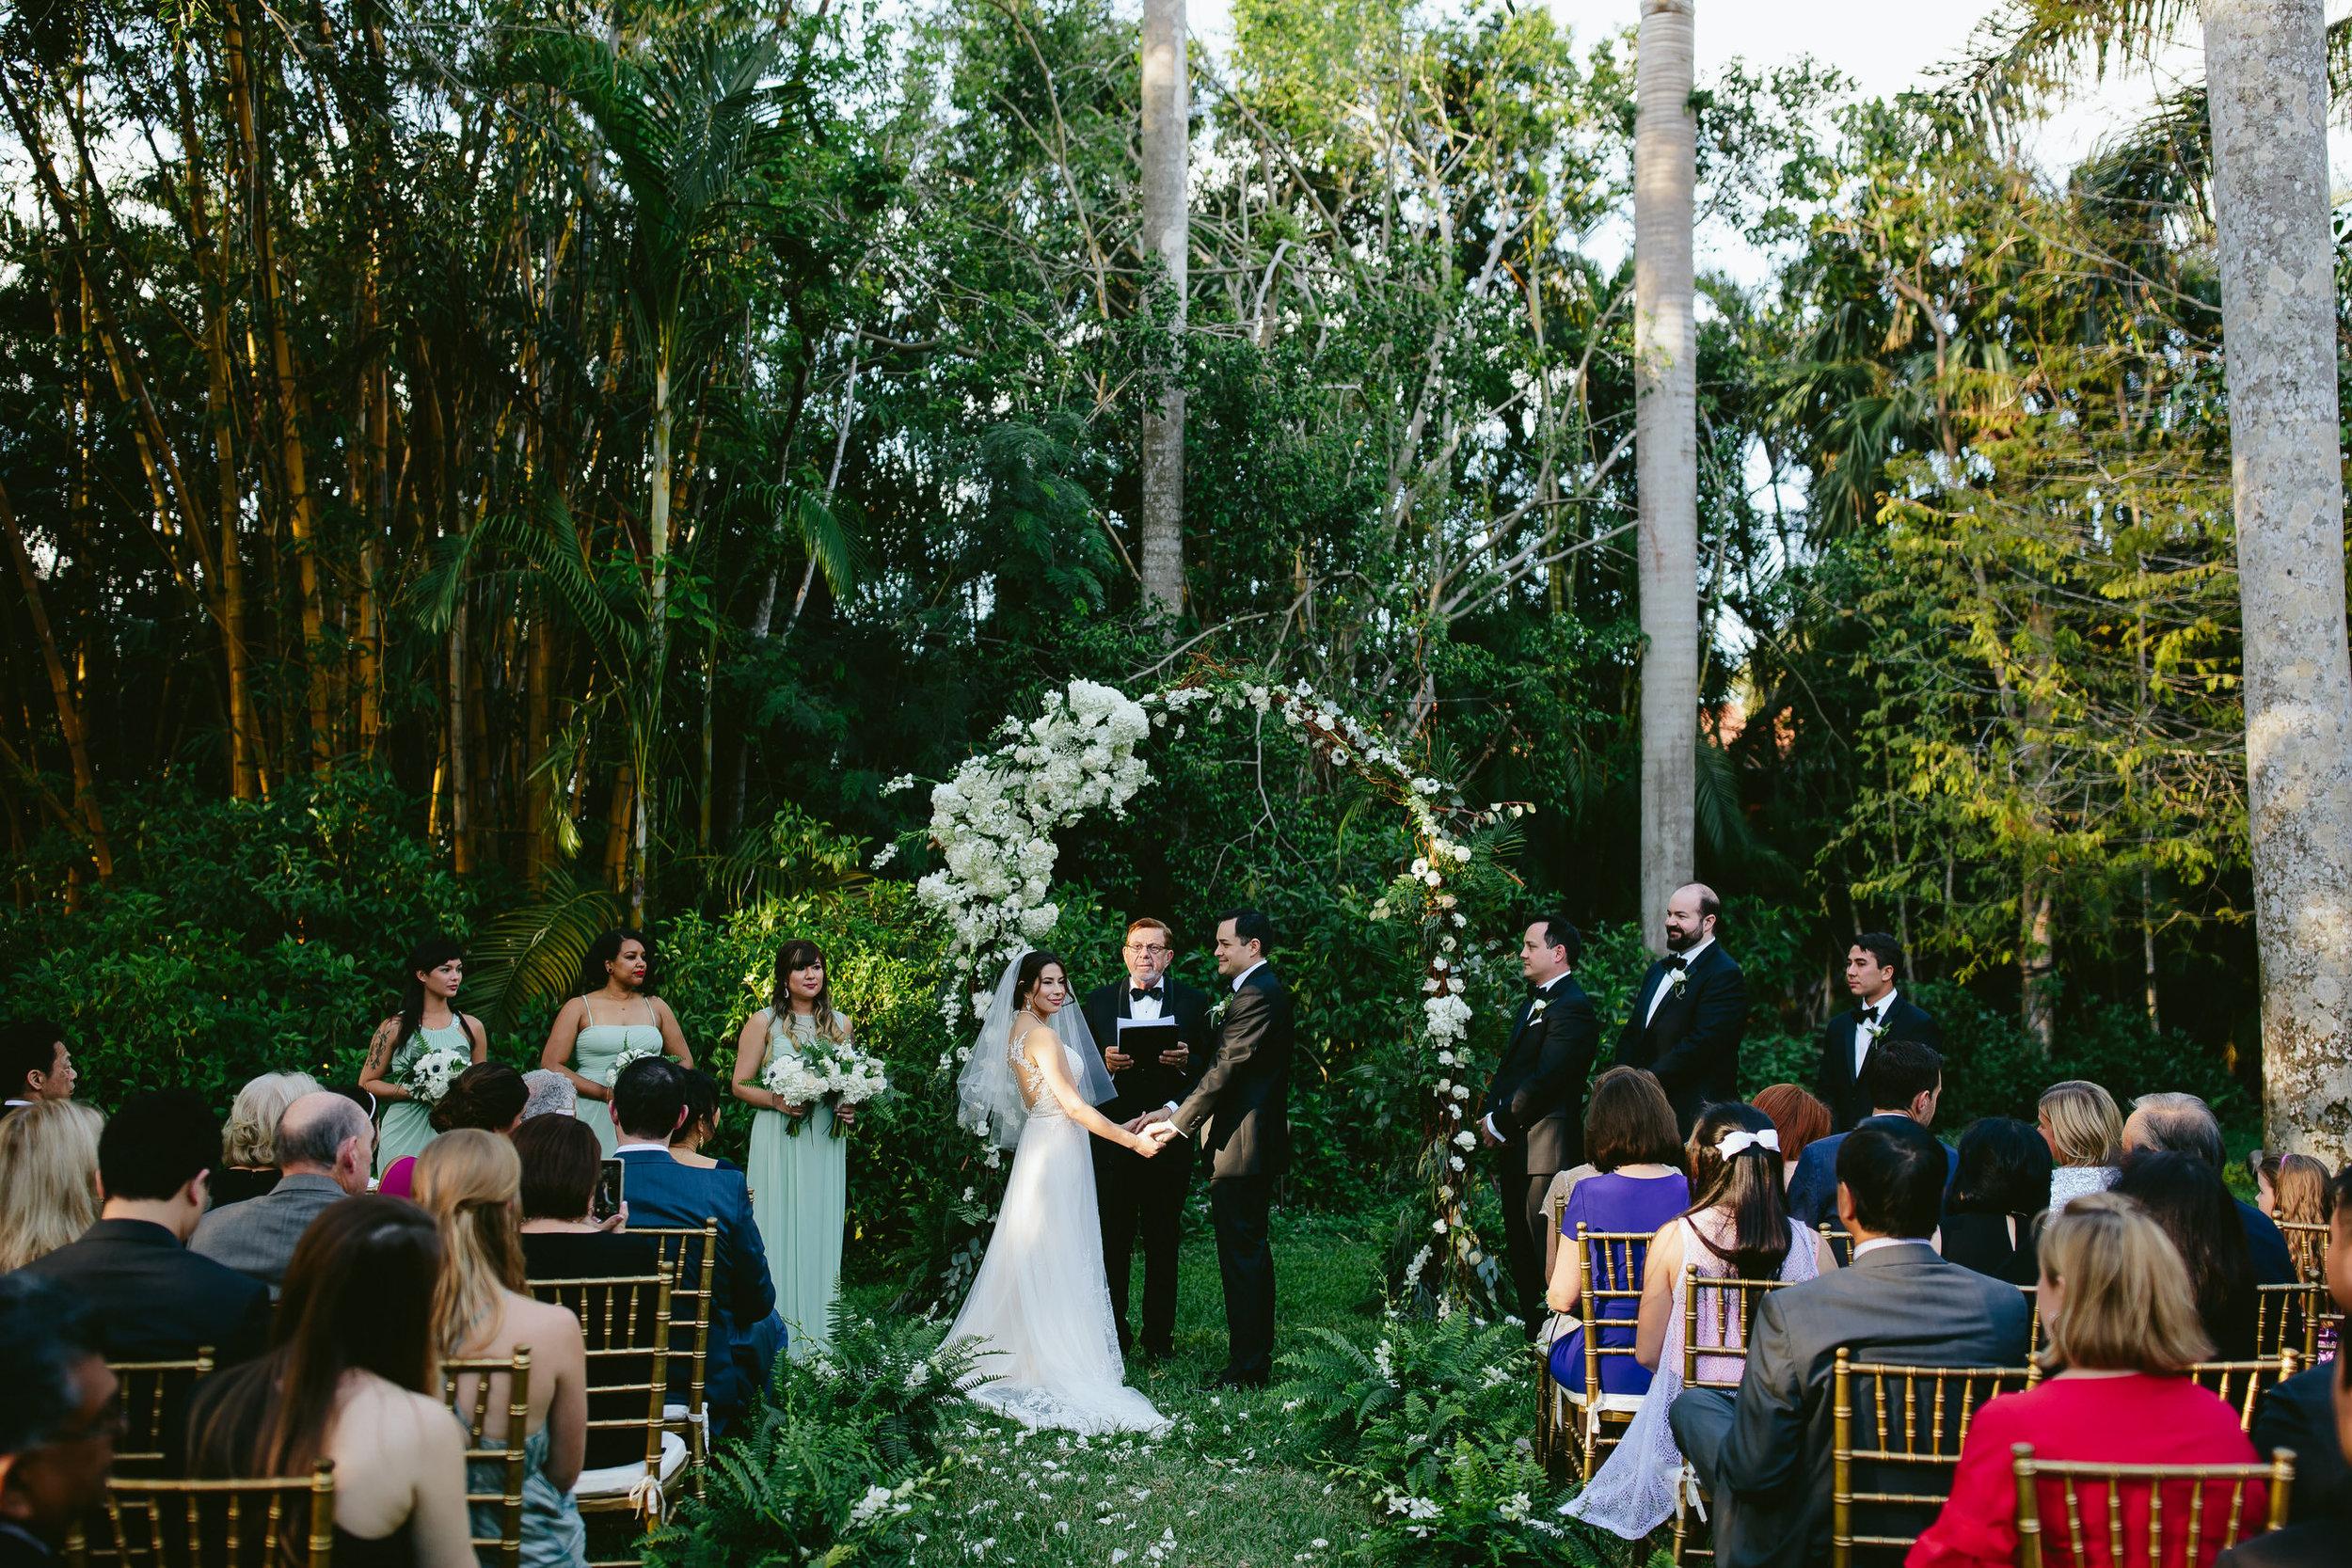 twilight_inspired_backyard_wedding_elegant_ethereal_ceremony_luxury_best_weddings_photography_tiny_house_photo.jpg